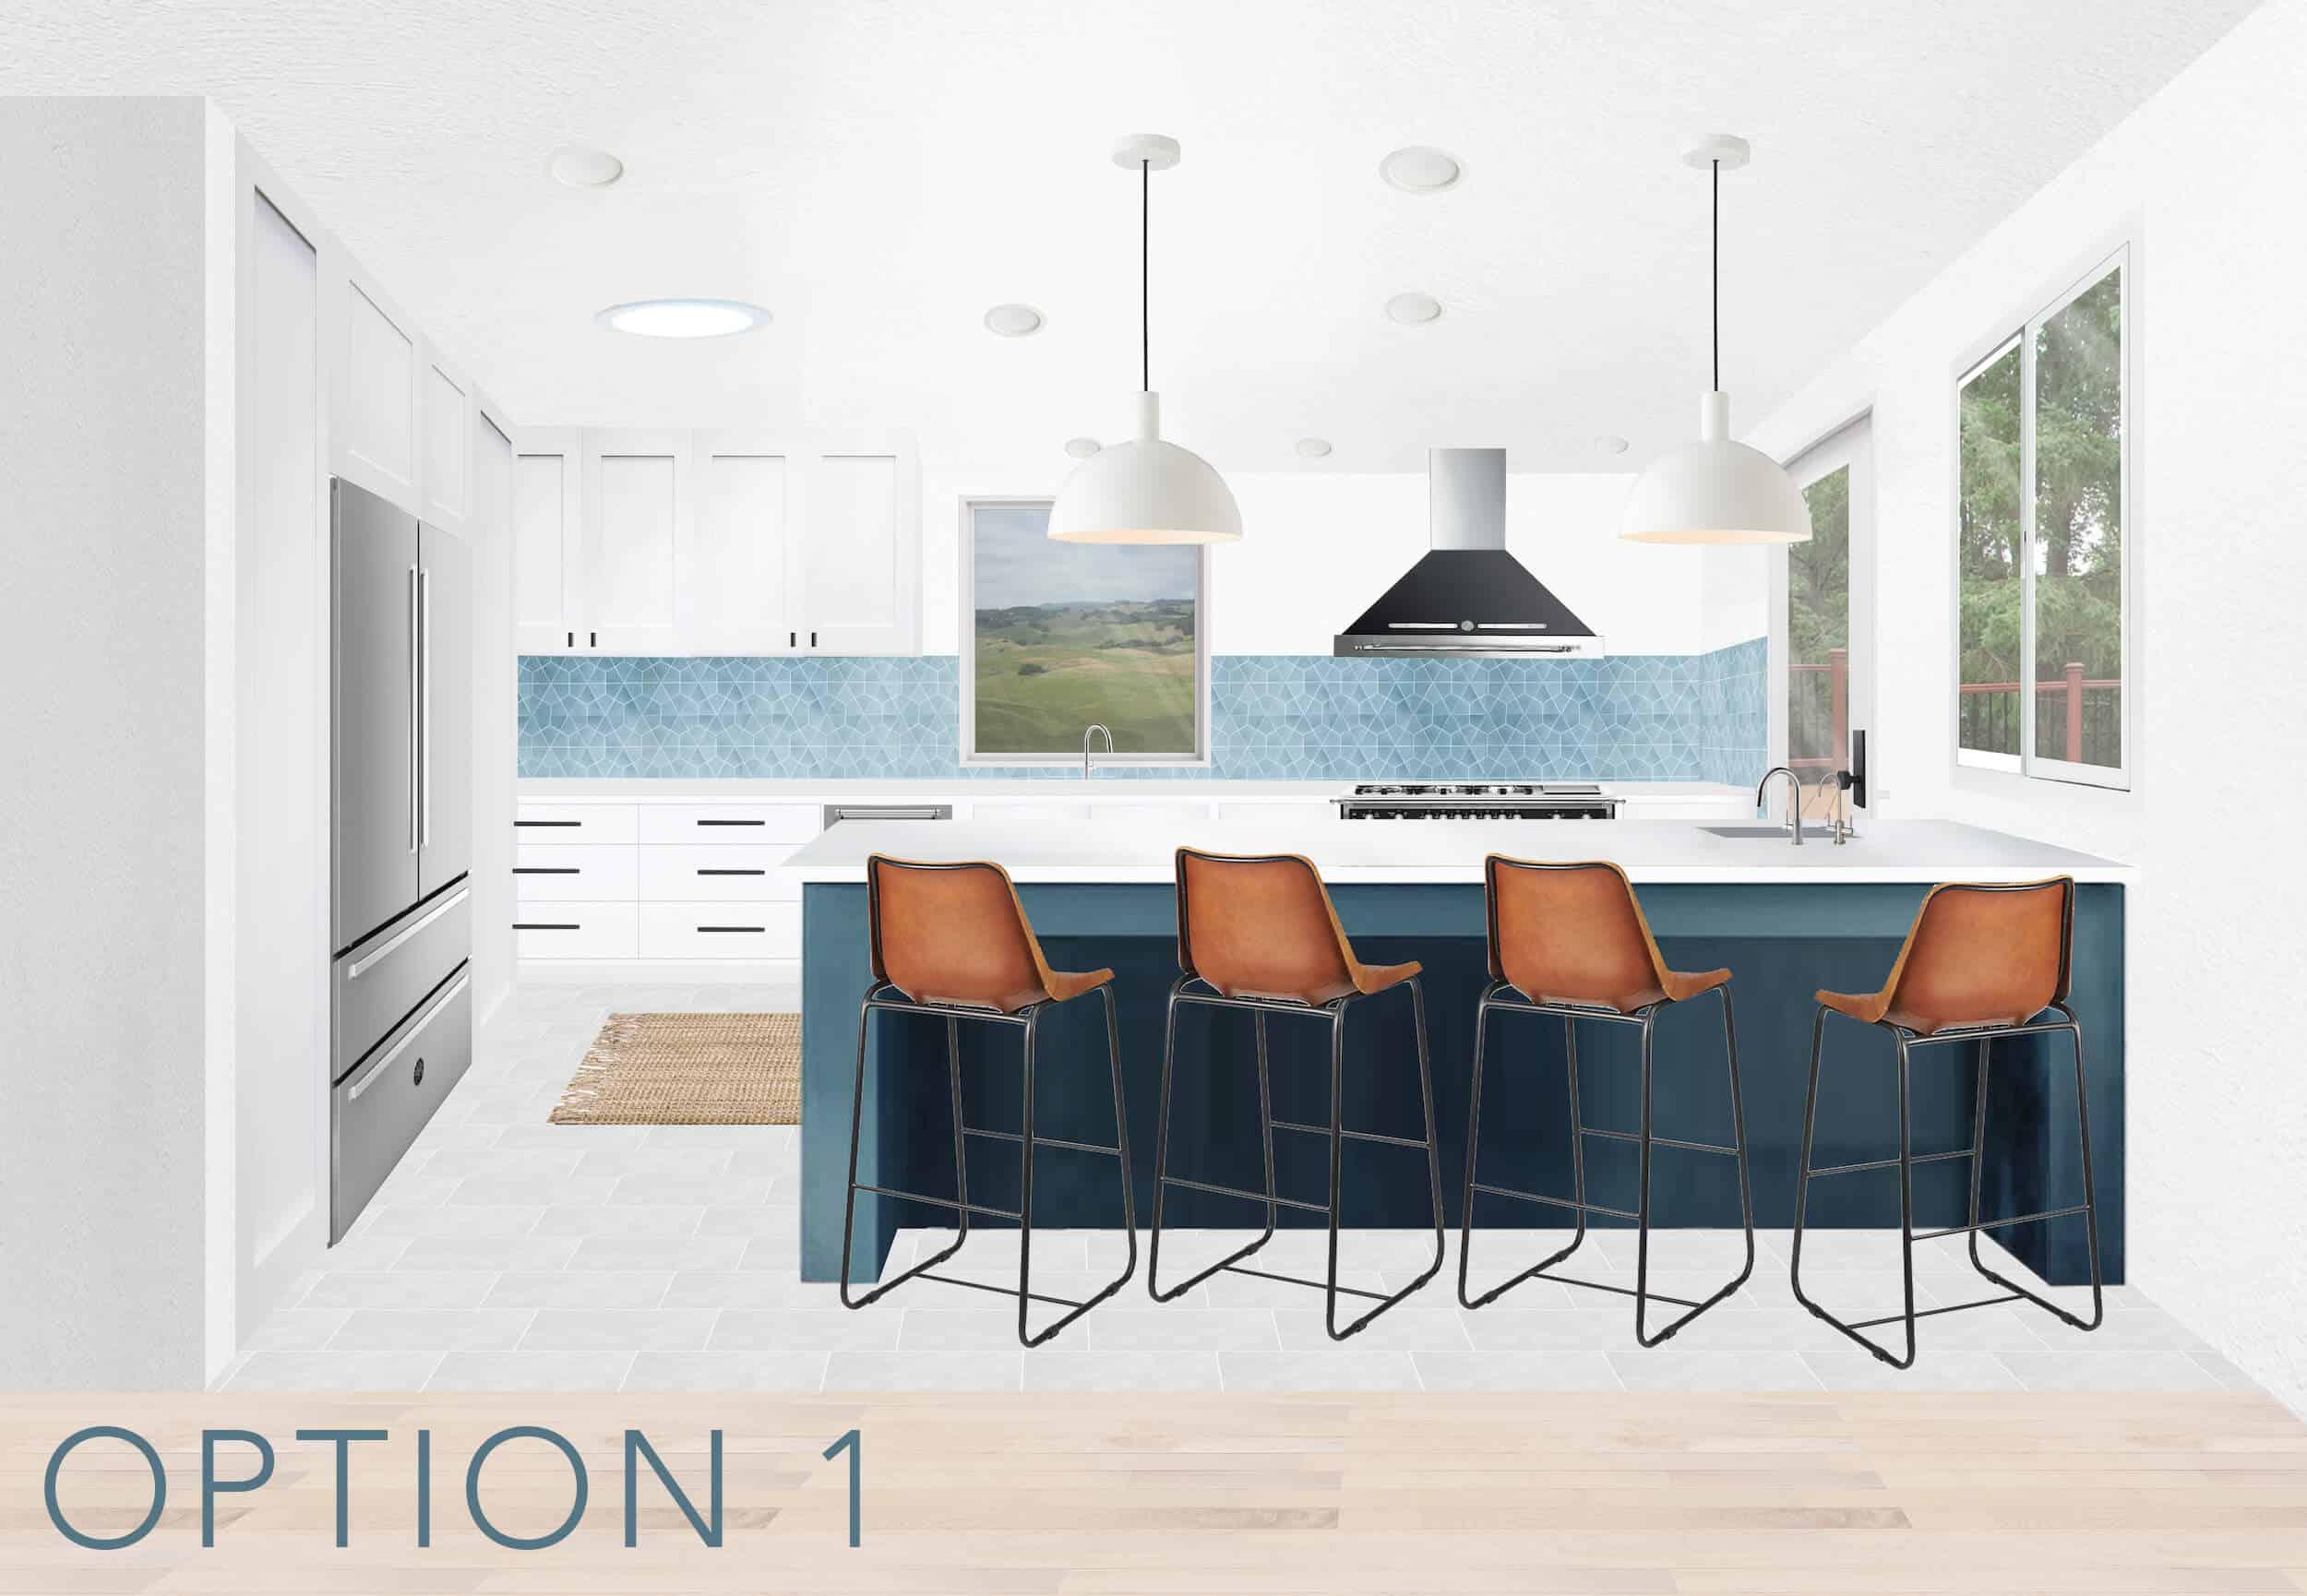 catherines-kitchen-render-option-1-text